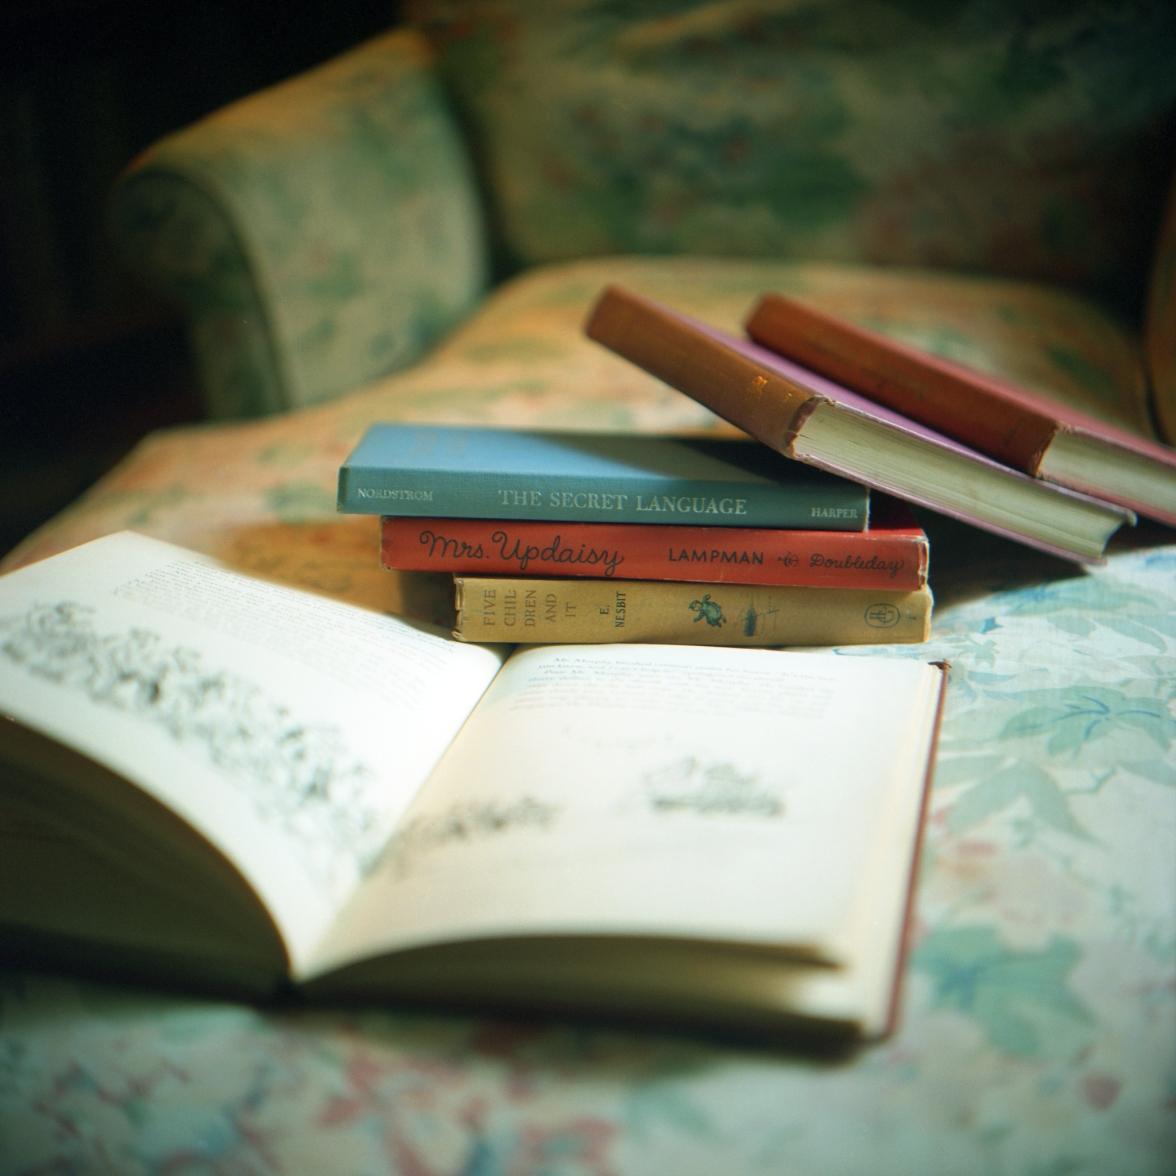 The Secret Language © Aline Smithson